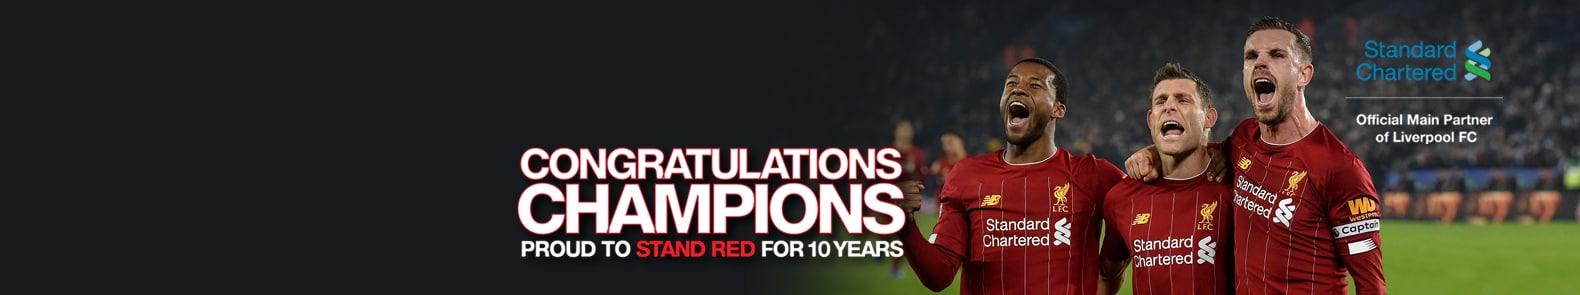 Congratulations Champions